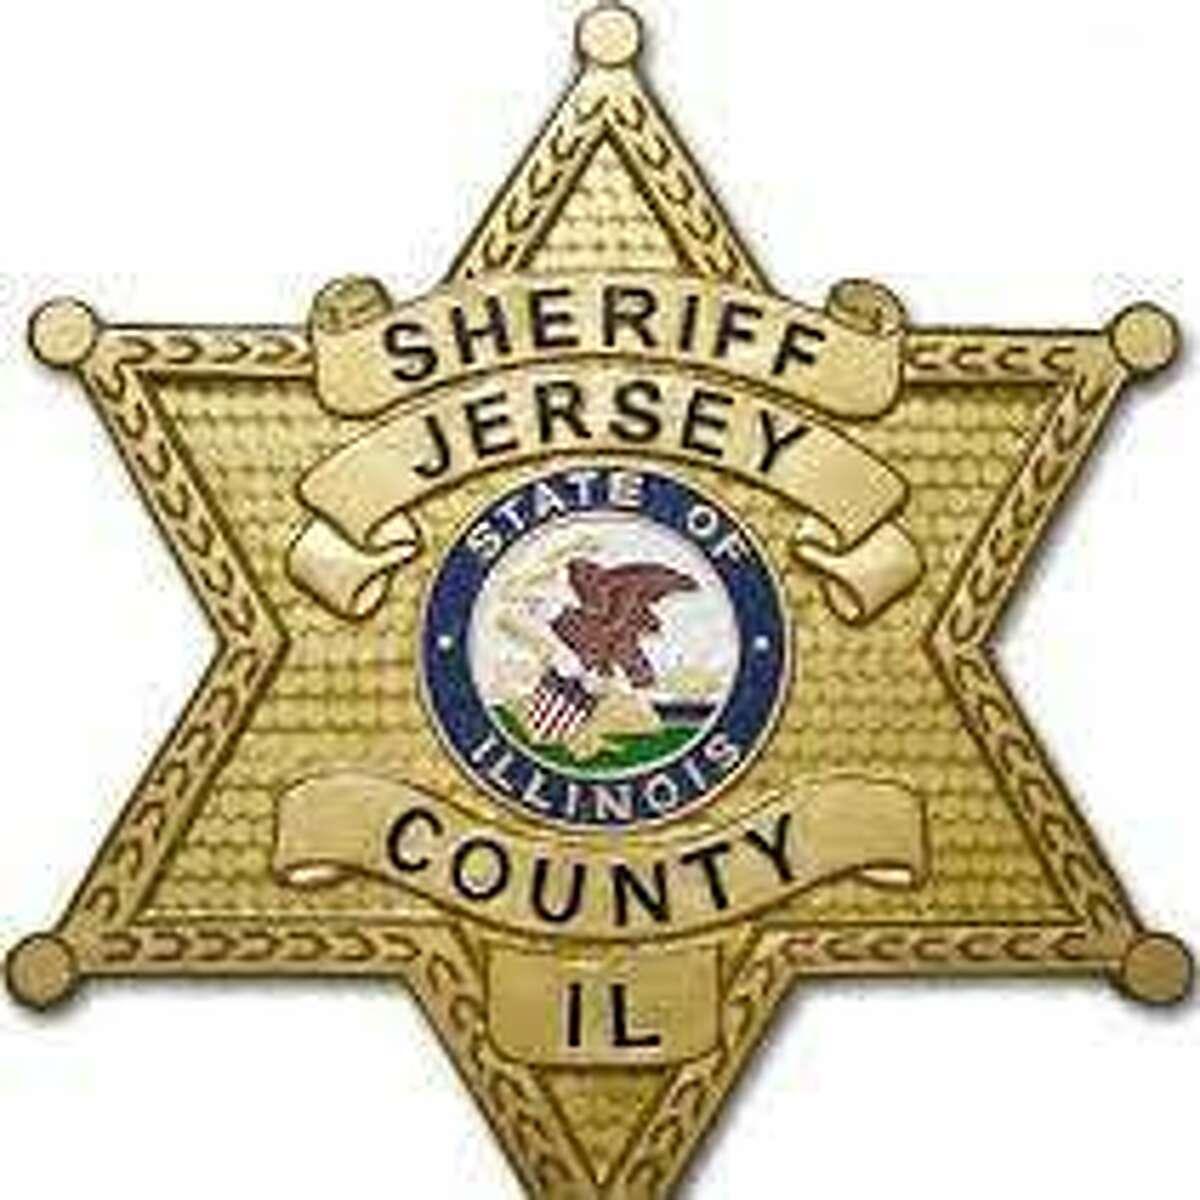 Jersey County, Illinois Sheriff's badge